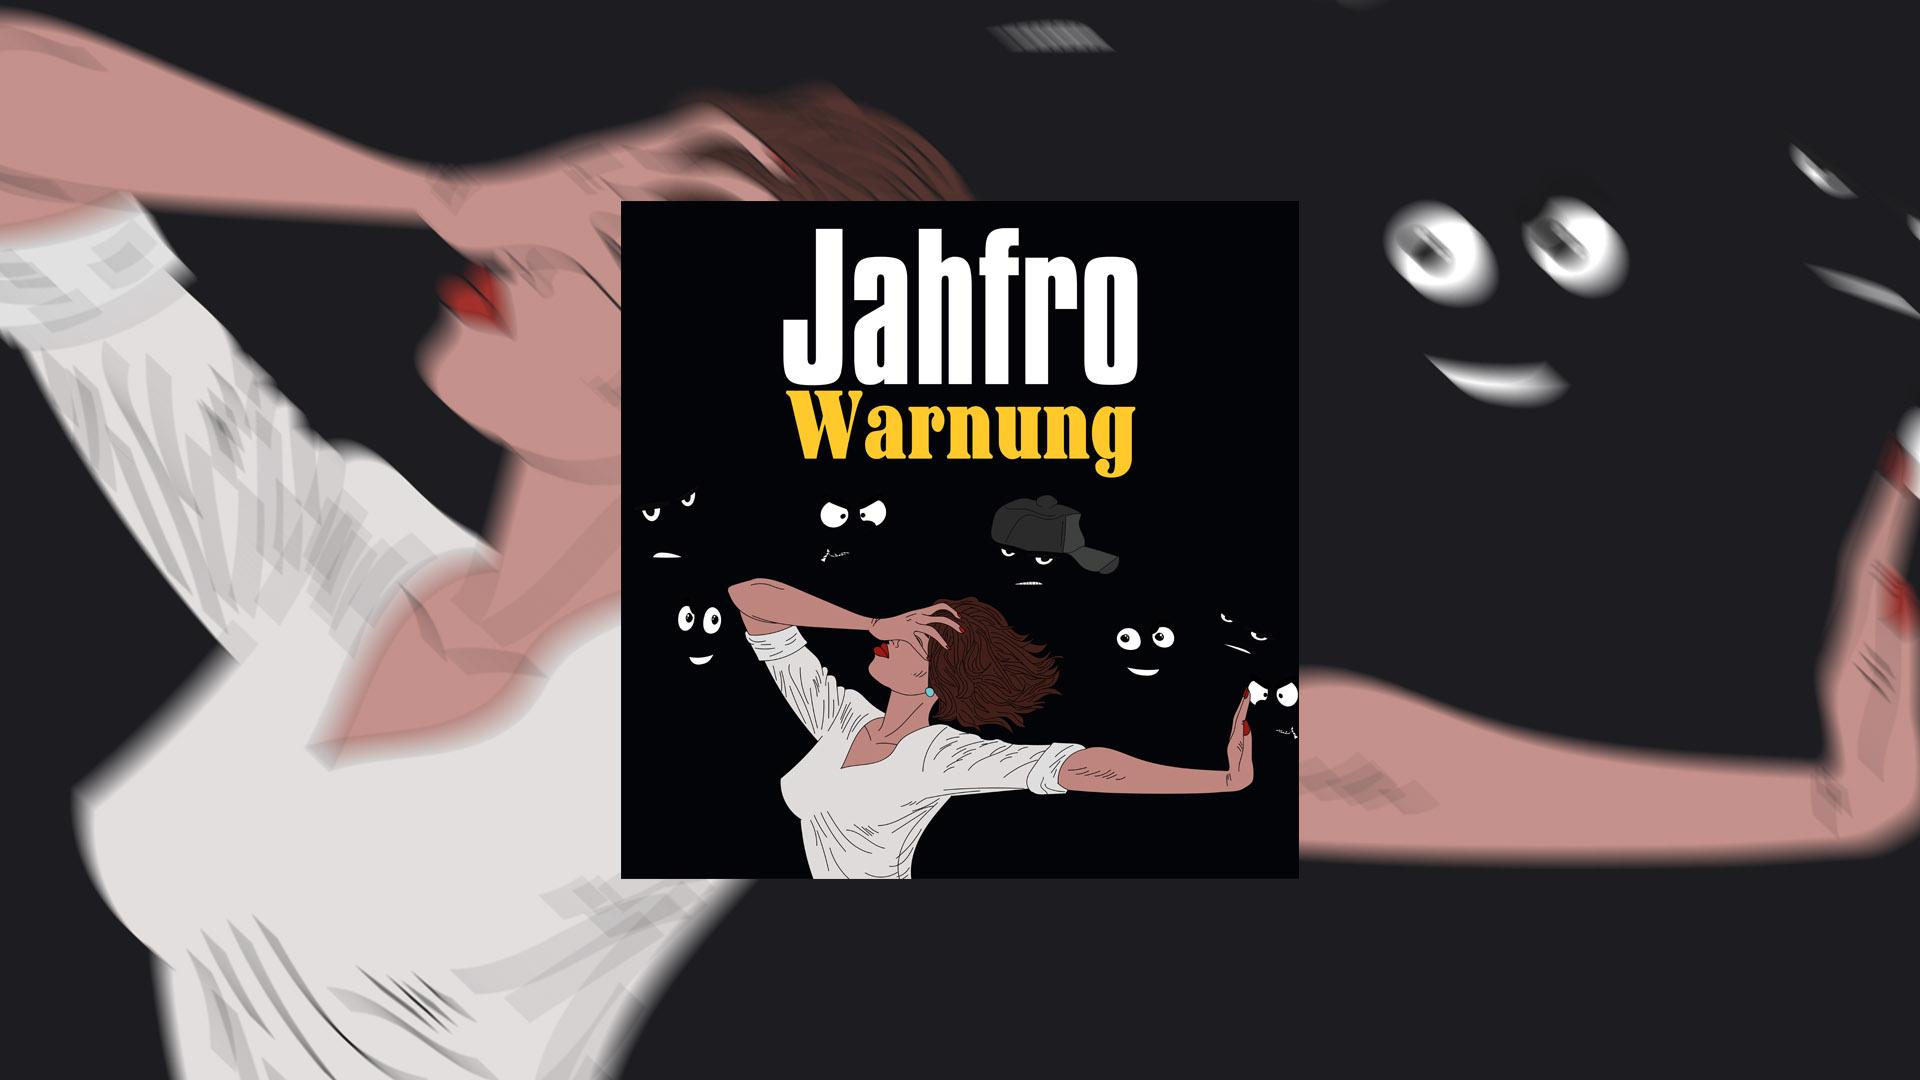 Jahfro - Warnung